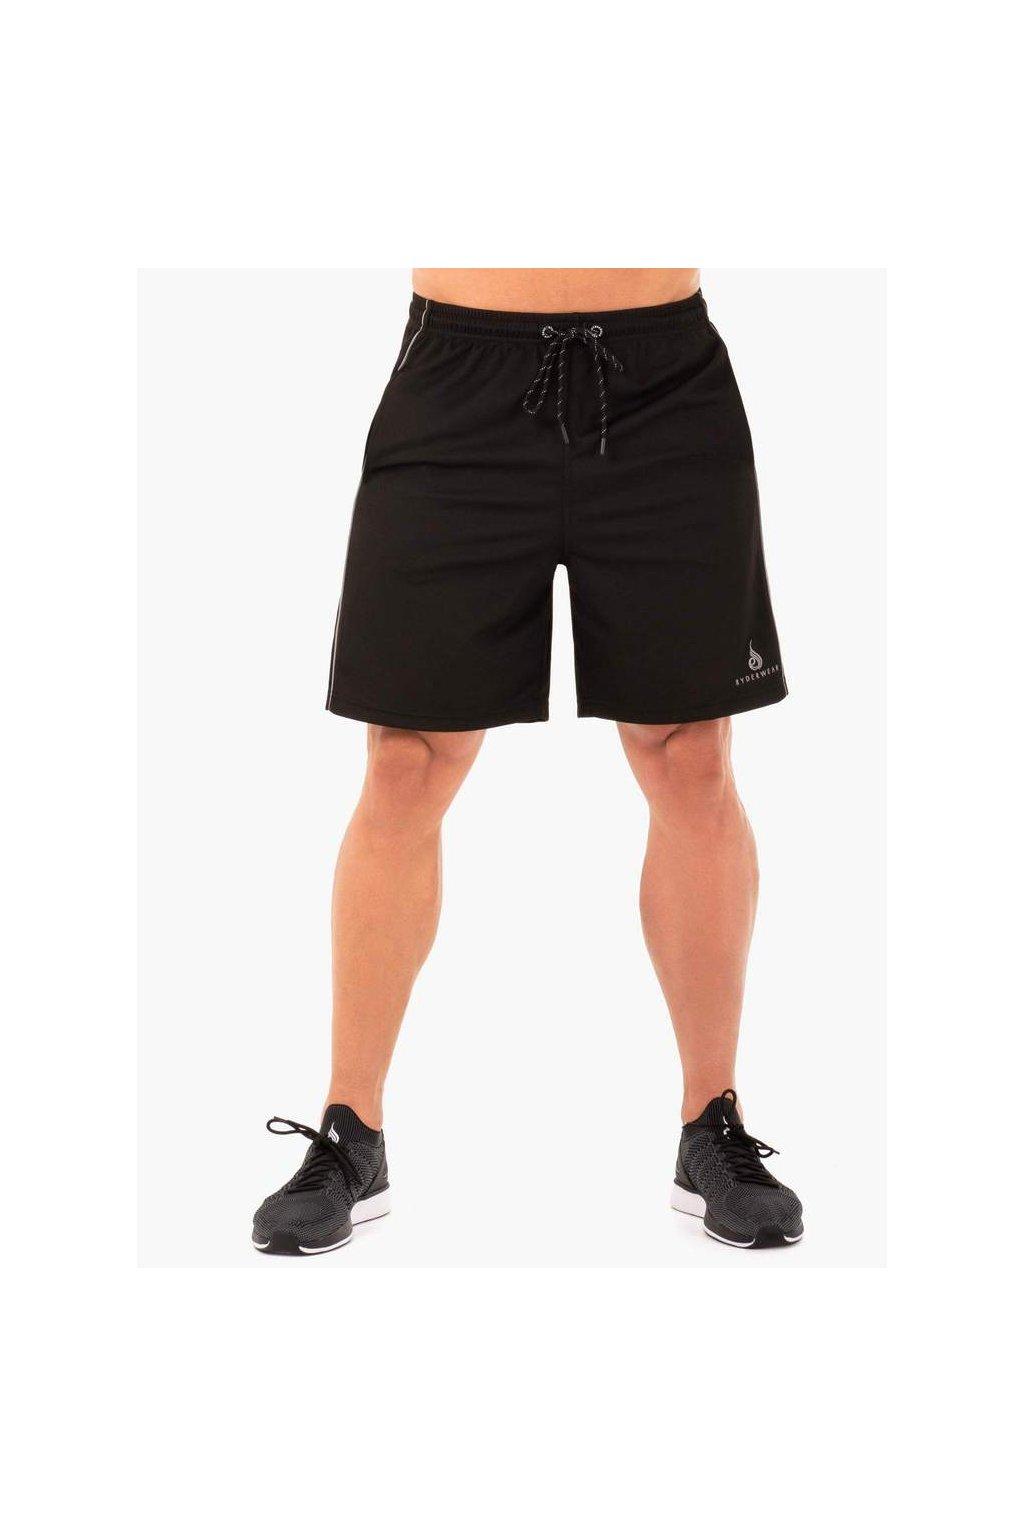 performance mesh shorts black clothing ryderwear 102038 1000x1000